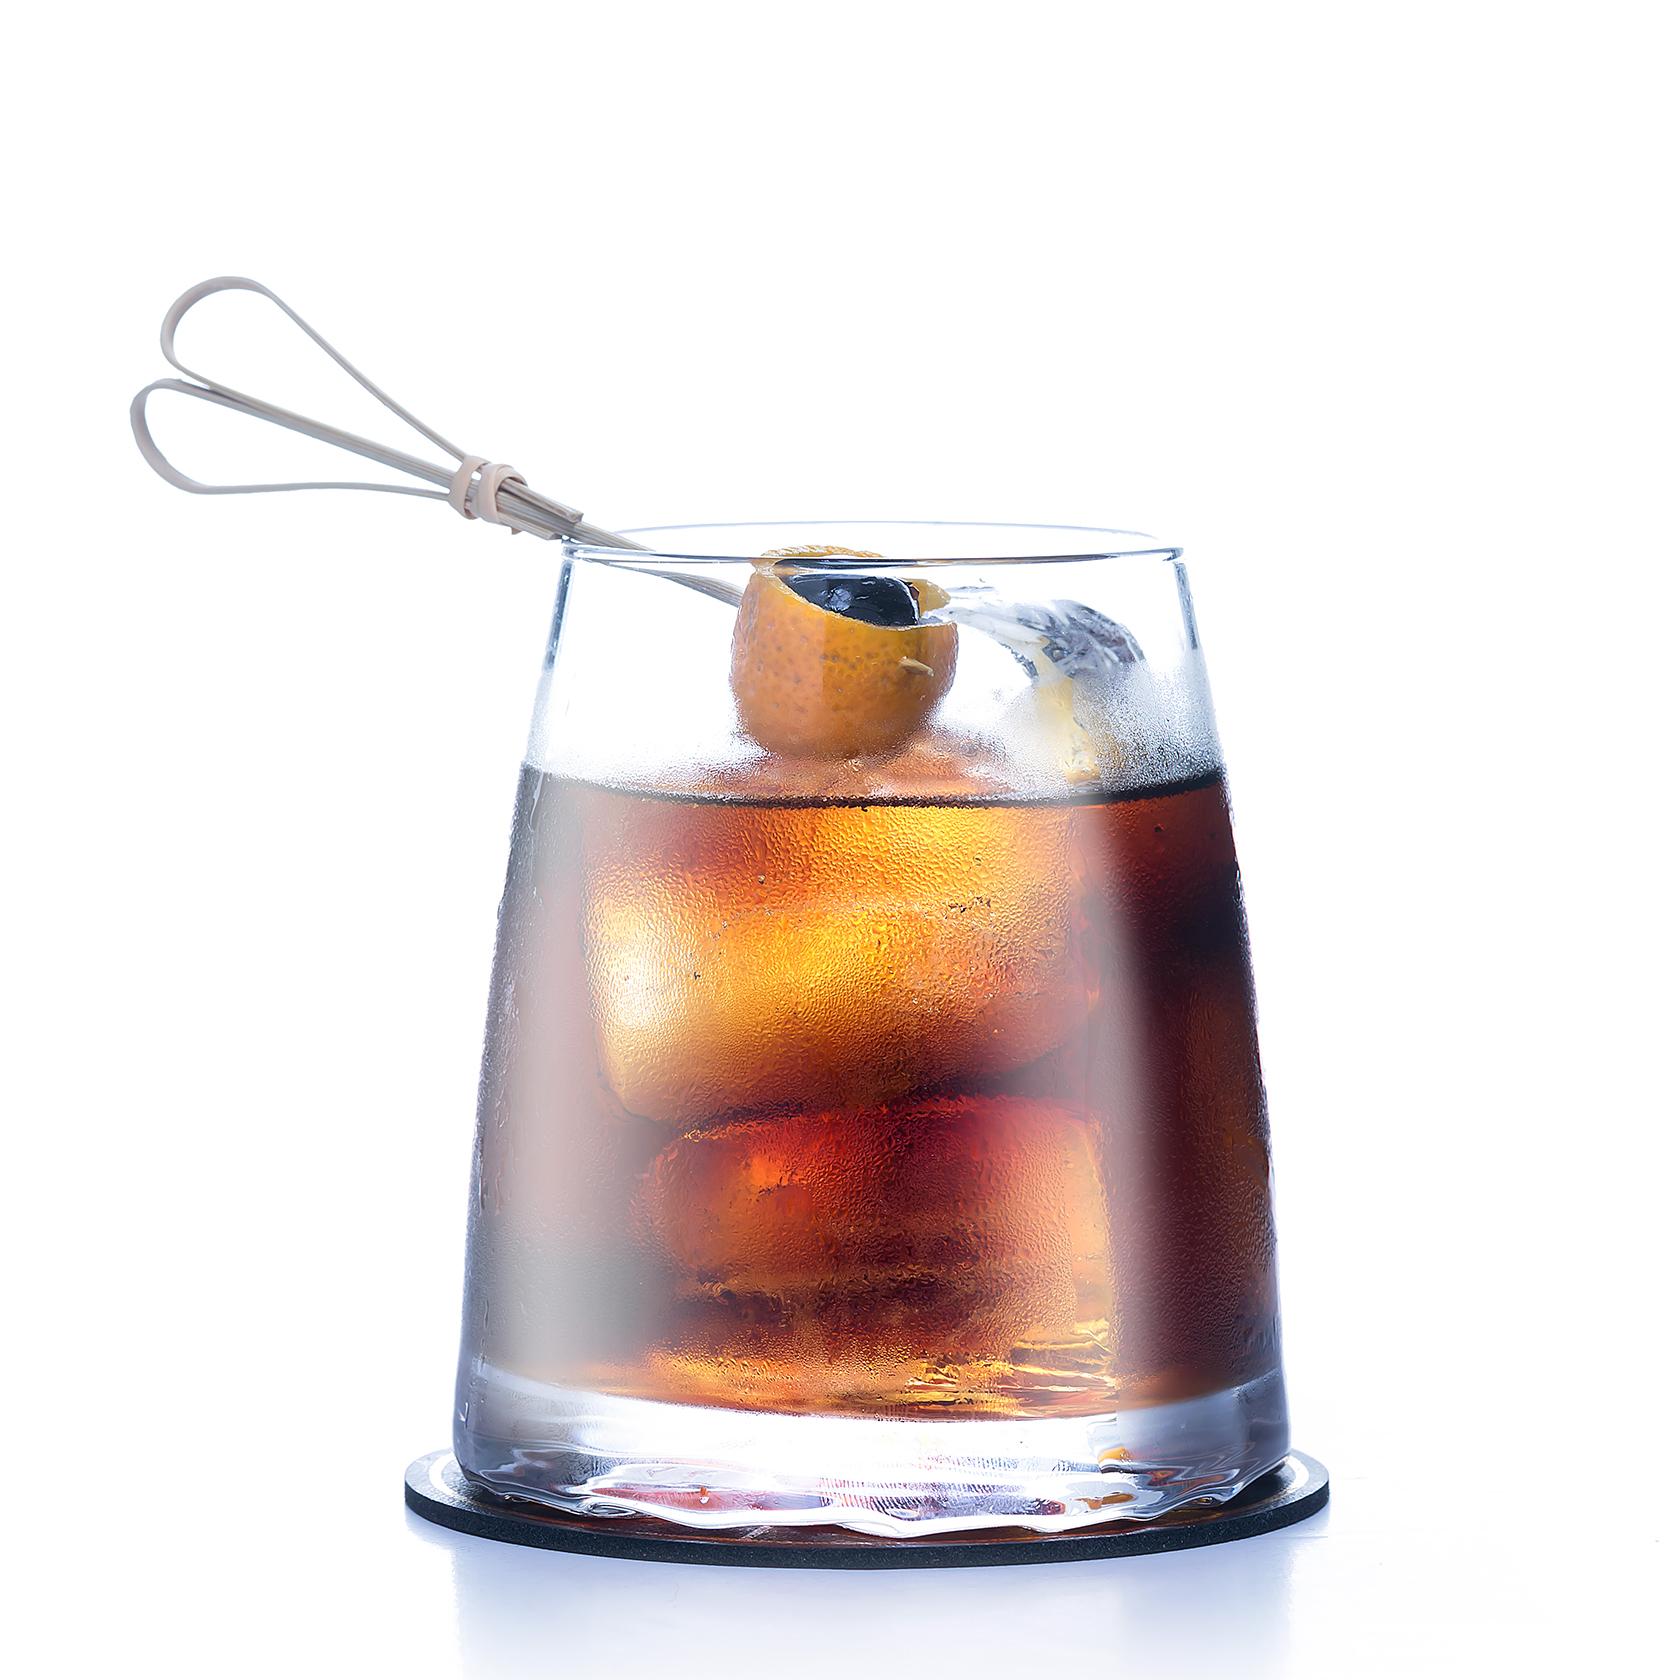 drinks-cocktails-cocteles-photographer-fotografo-photography-fotografia-mixology-bartending-La-Sole-del-Pimpi-Malaga-Sr-Erreka-Photo-diego-erreka-shakti-de-raco-españa-spain-advertising-producto-bebidas.jpg